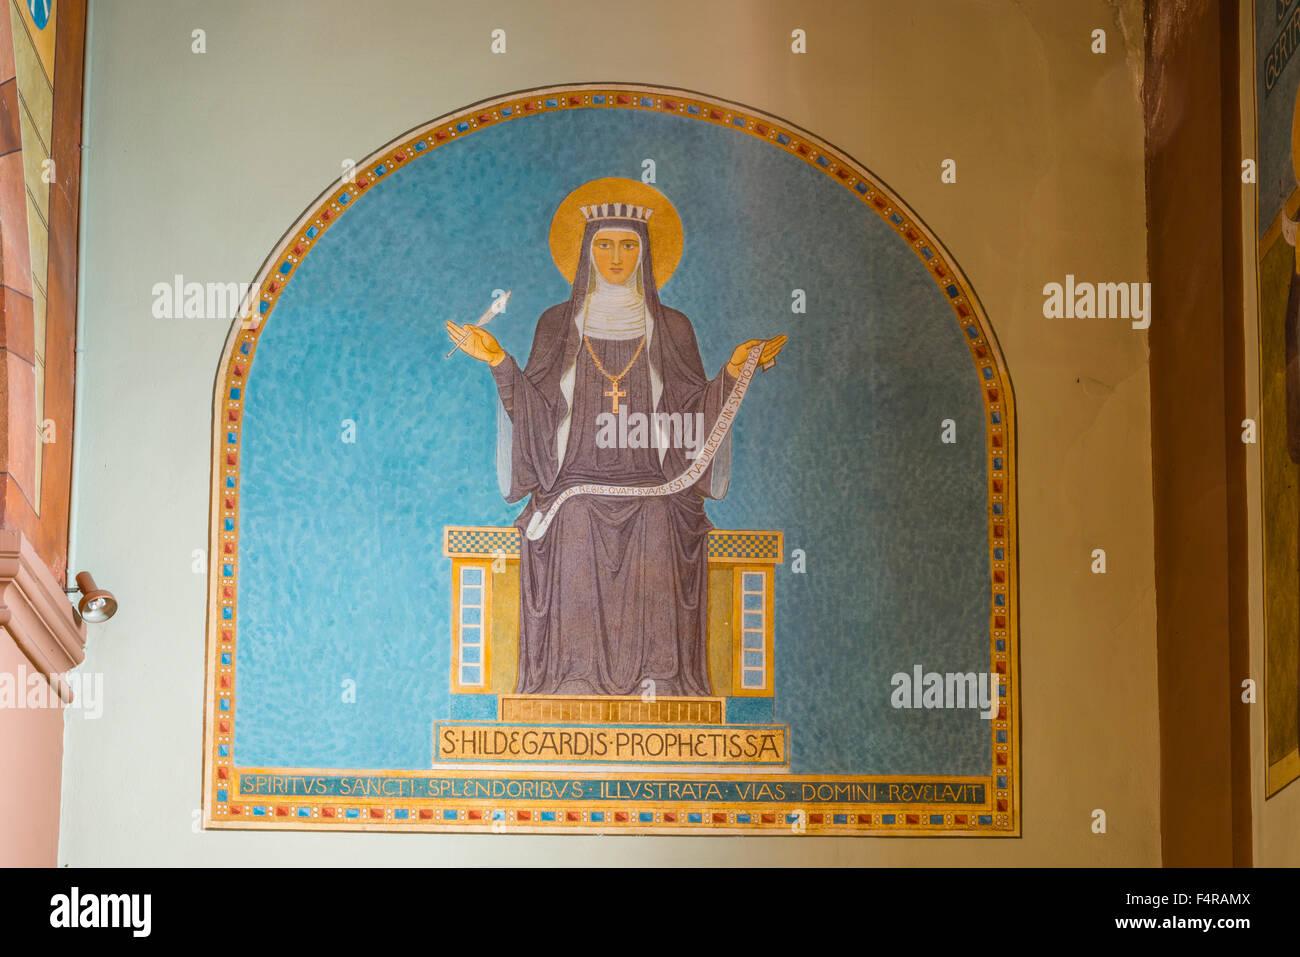 Benedictine, adviser, picture, Bingen, Christianity, Germany, poet, ethics, Europe, saints, Hessen, Hildegard, church, - Stock Image